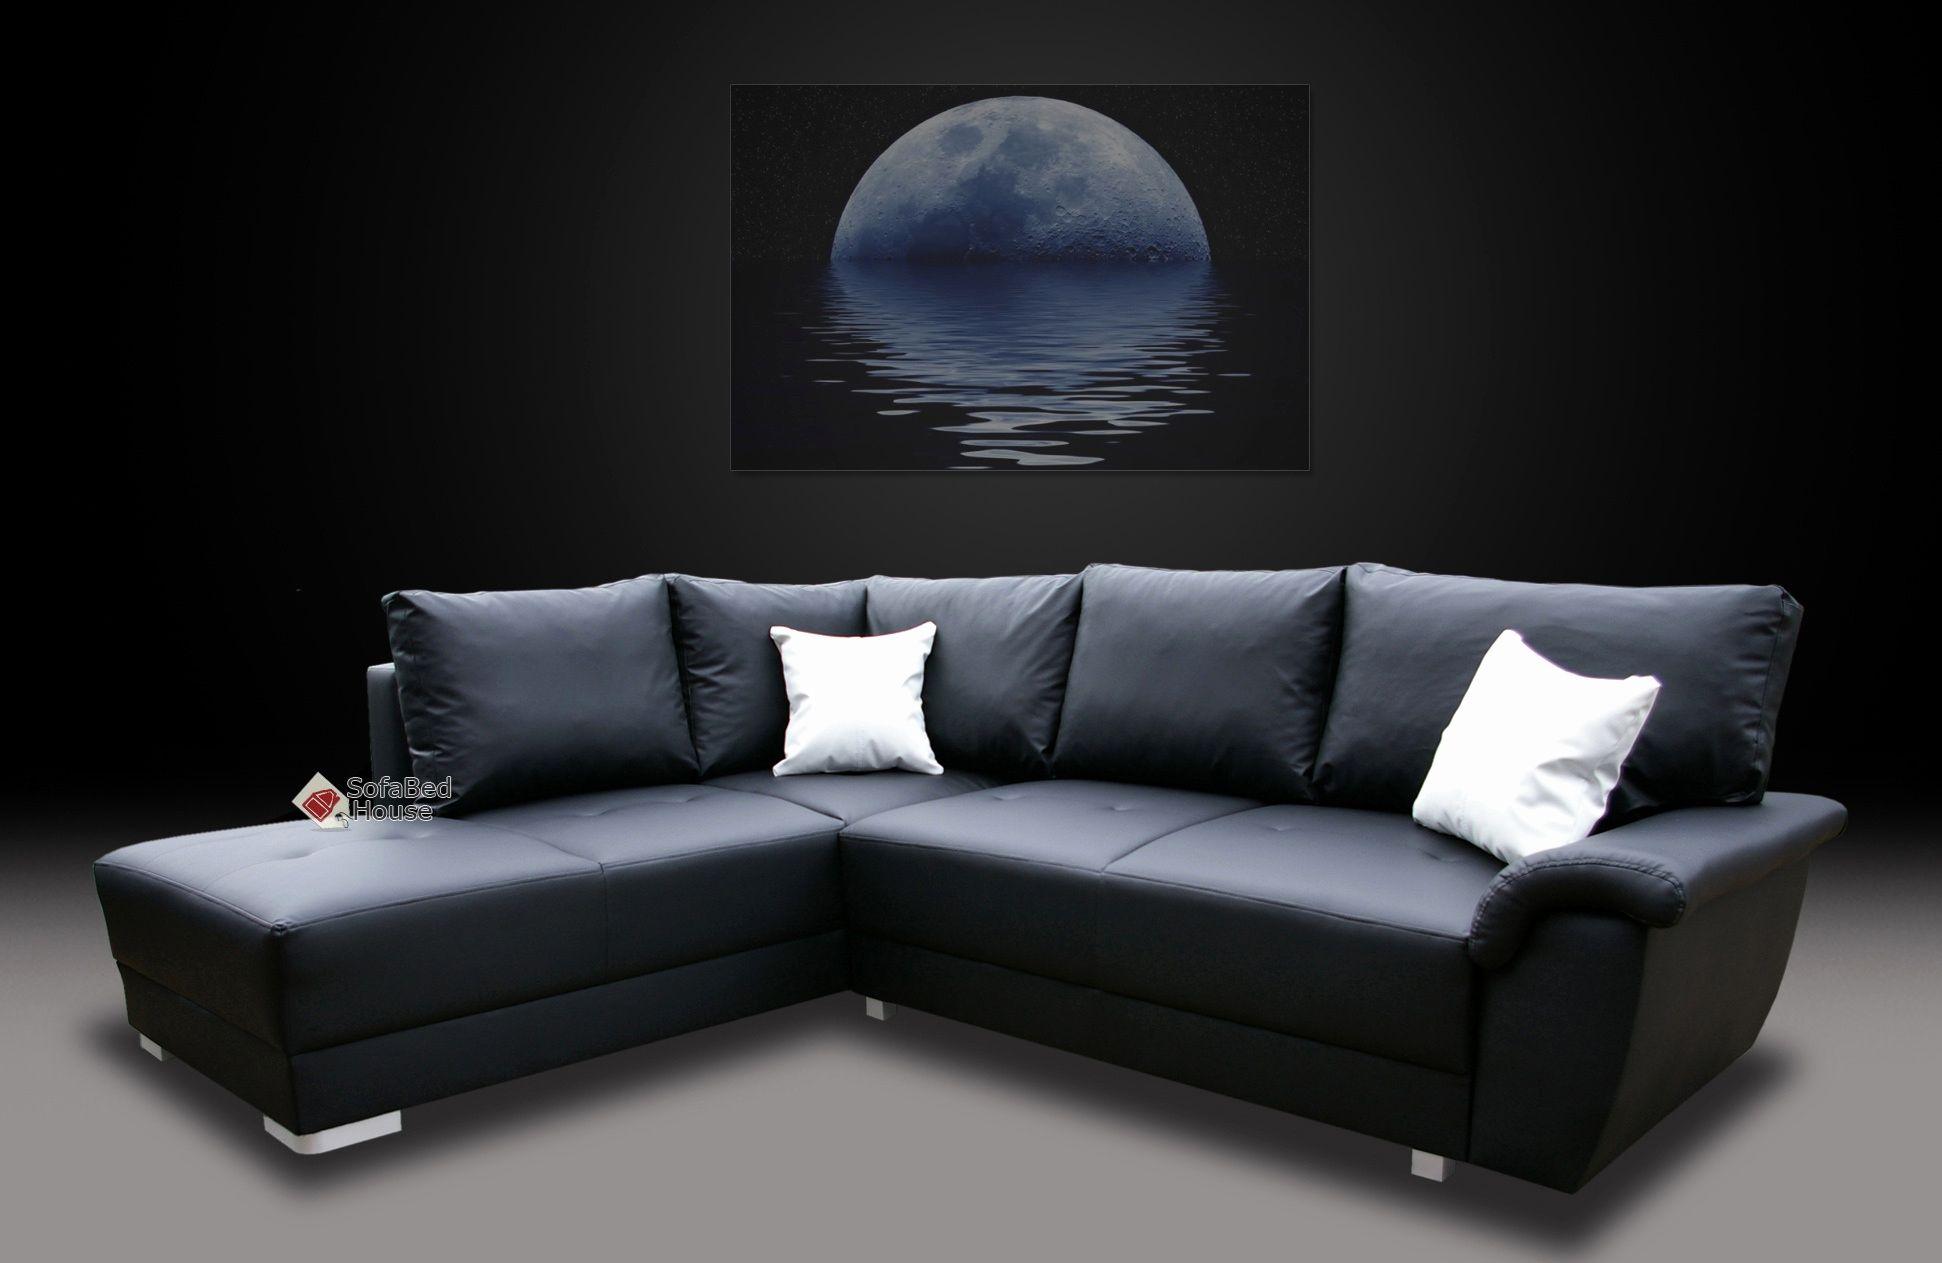 unique modern sofa bed toronto pics modern sofa bed toronto